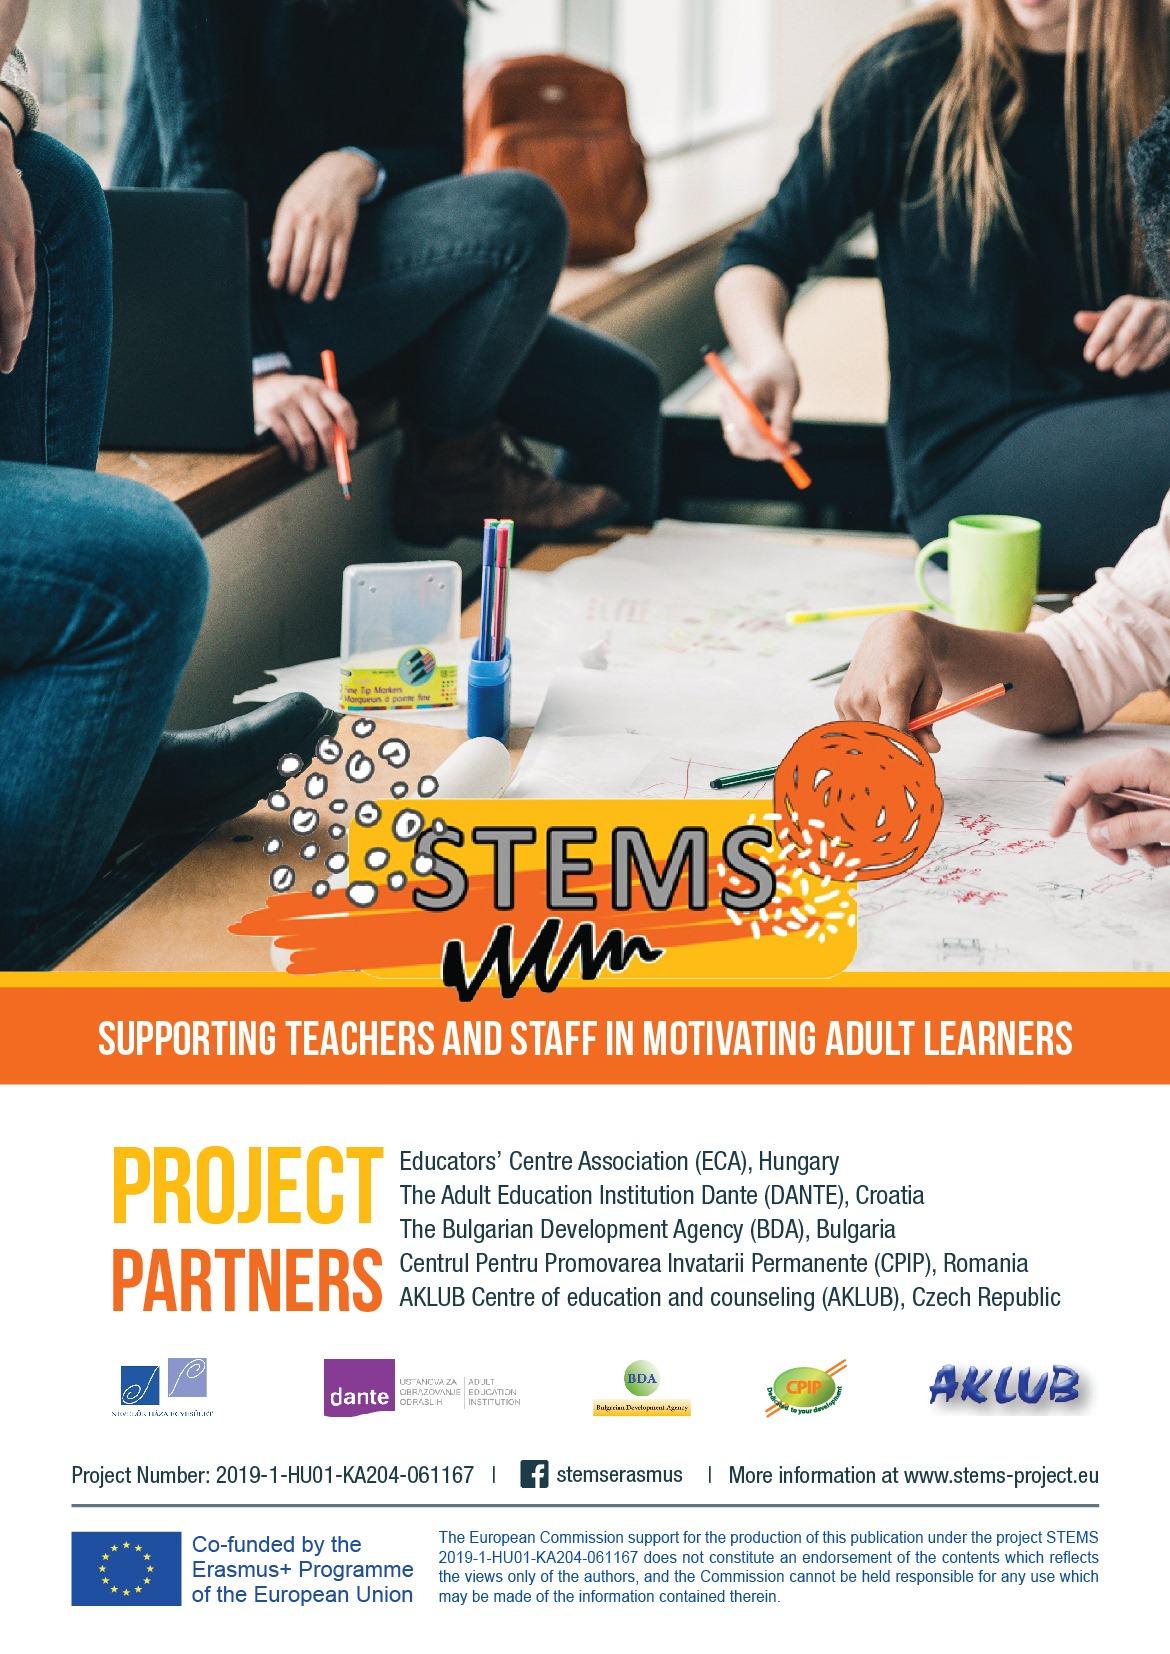 STEMS poster